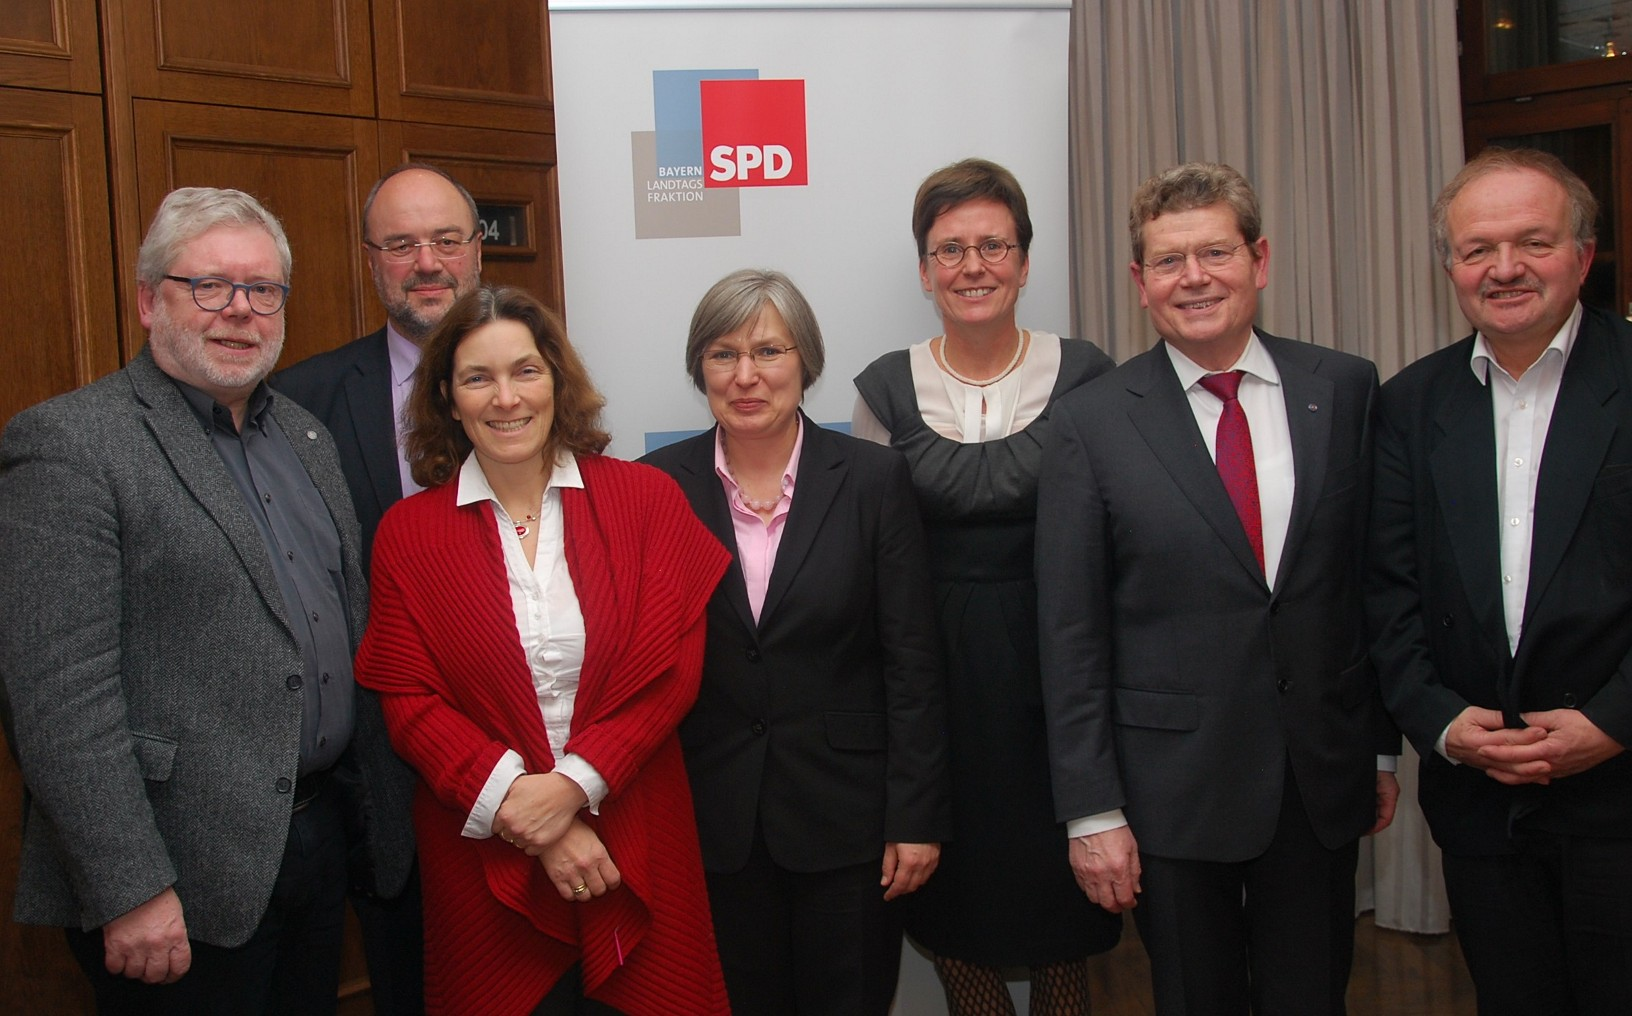 v.l.n.r.: Godehard Ruppert, Kerstin Celina, Sabine Happ, Isabell Zacharias, Georg Rosenthal, Michael Hollmann.